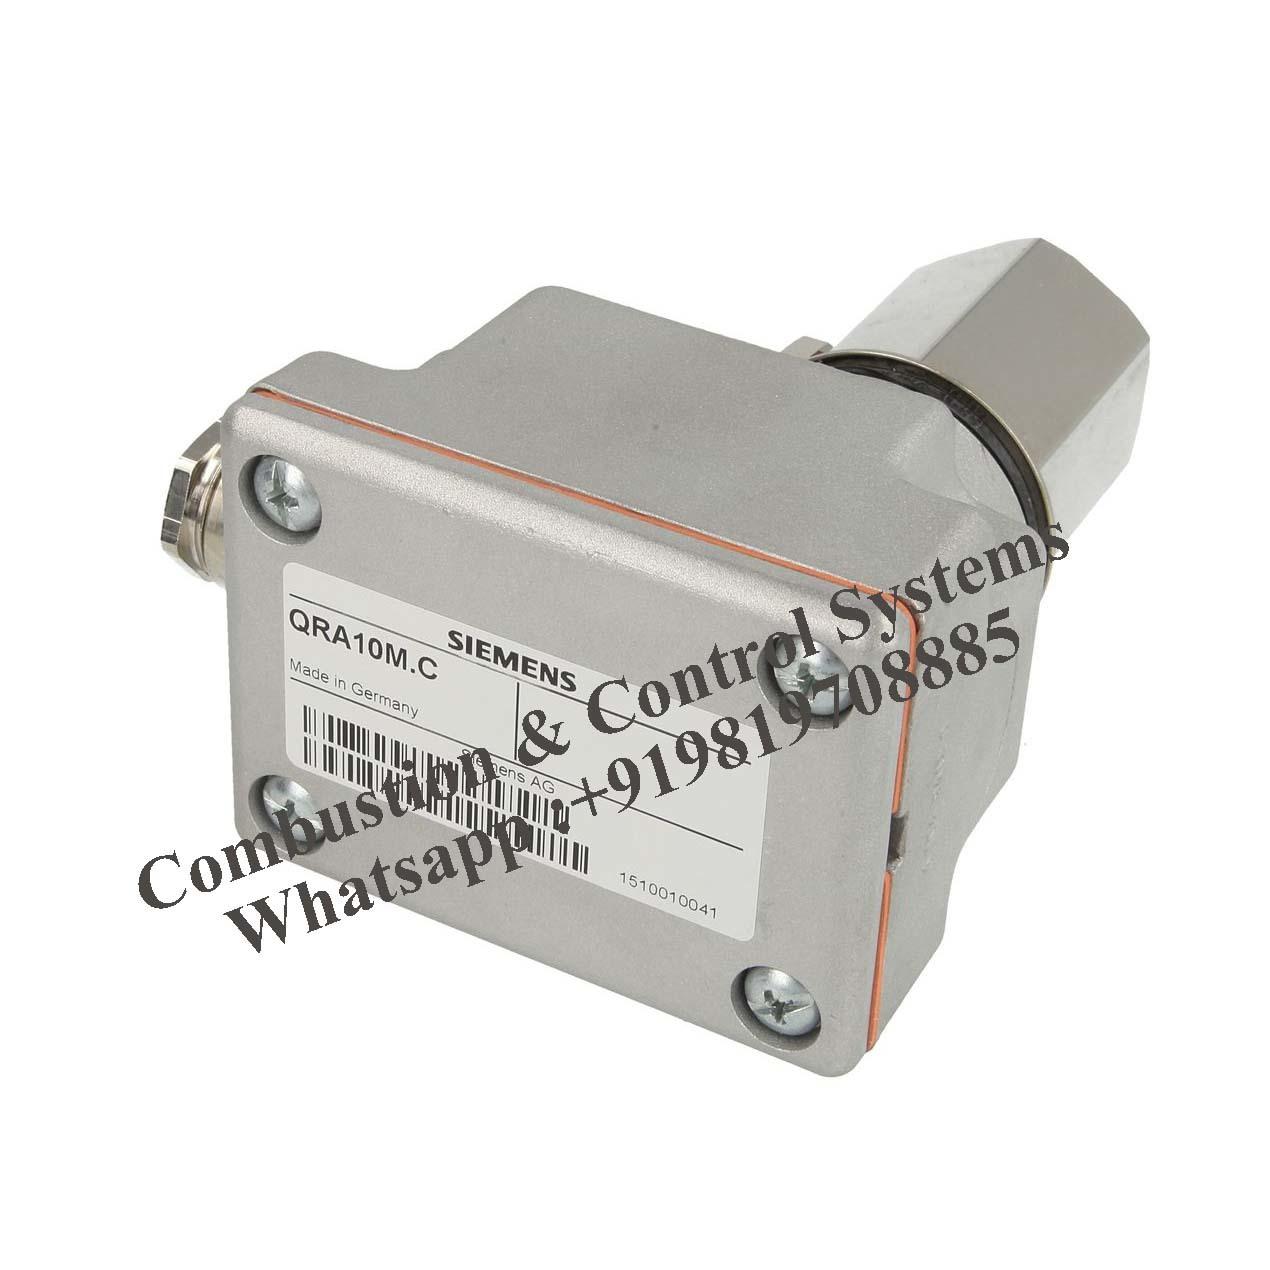 UV Flame Sensor QRA10M C